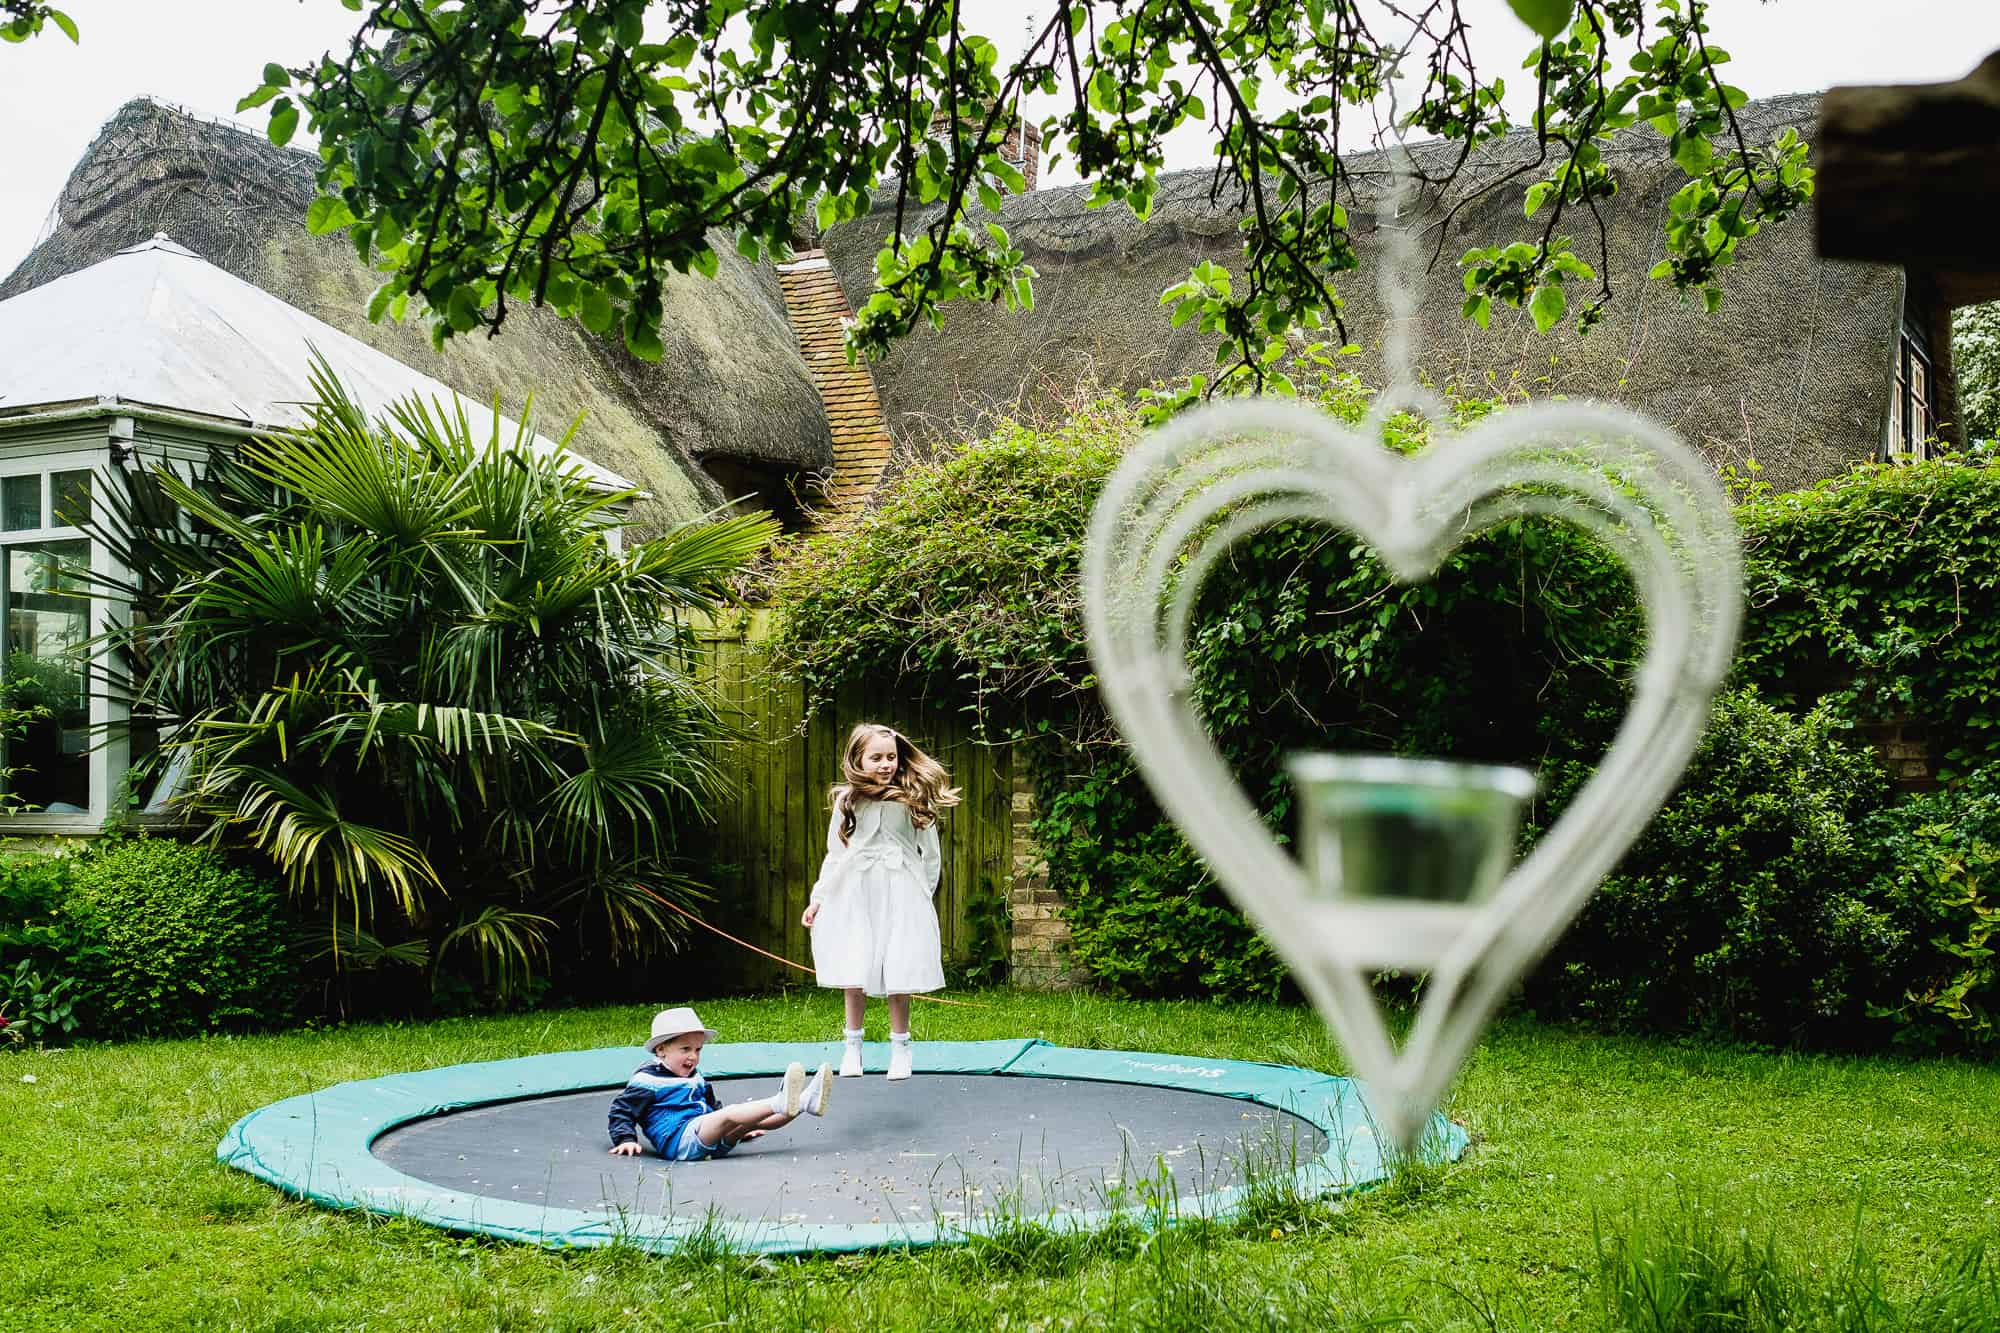 marleybrook-house-wedding-photography-matt-tyler-0033